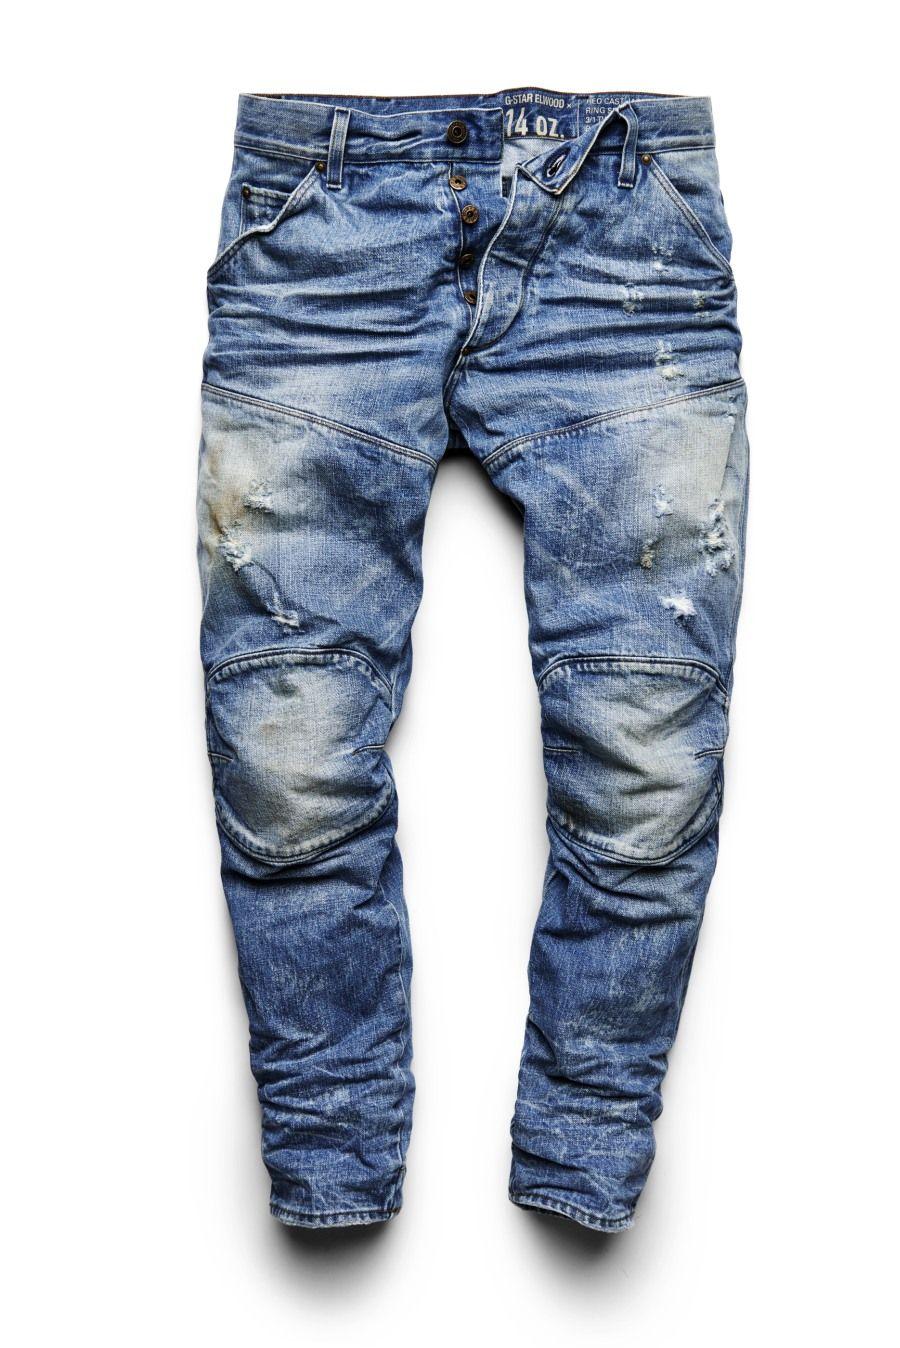 cb124ce4941 14 oz. RED LISTING G-STAR ELWOOD   Jinsida   Ripped jeans men, Denim ...